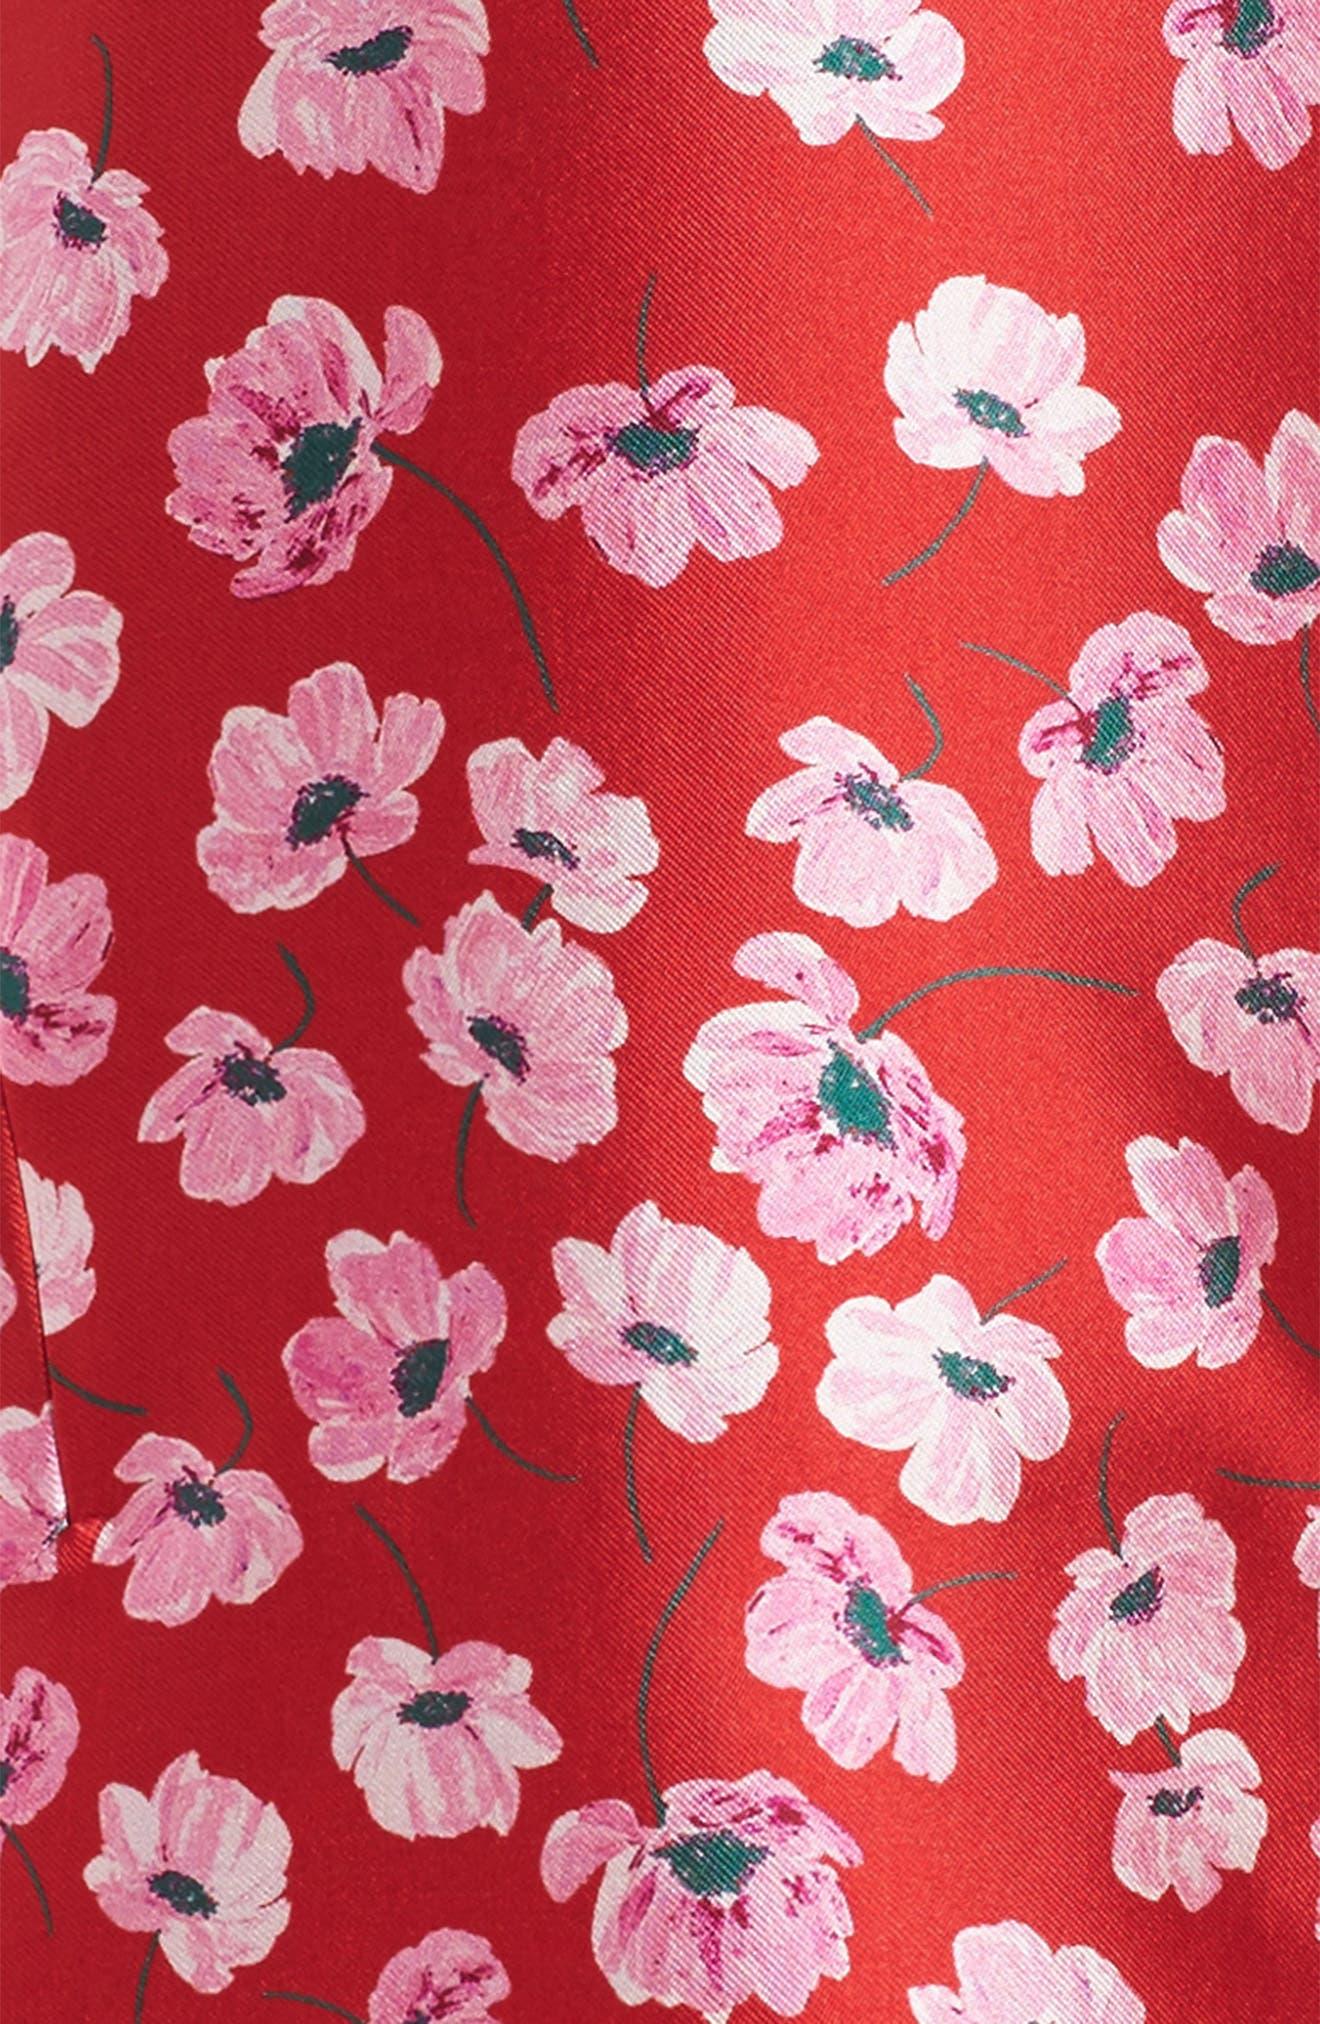 Poppies Mikado Dress,                             Alternate thumbnail 2, color,                             639